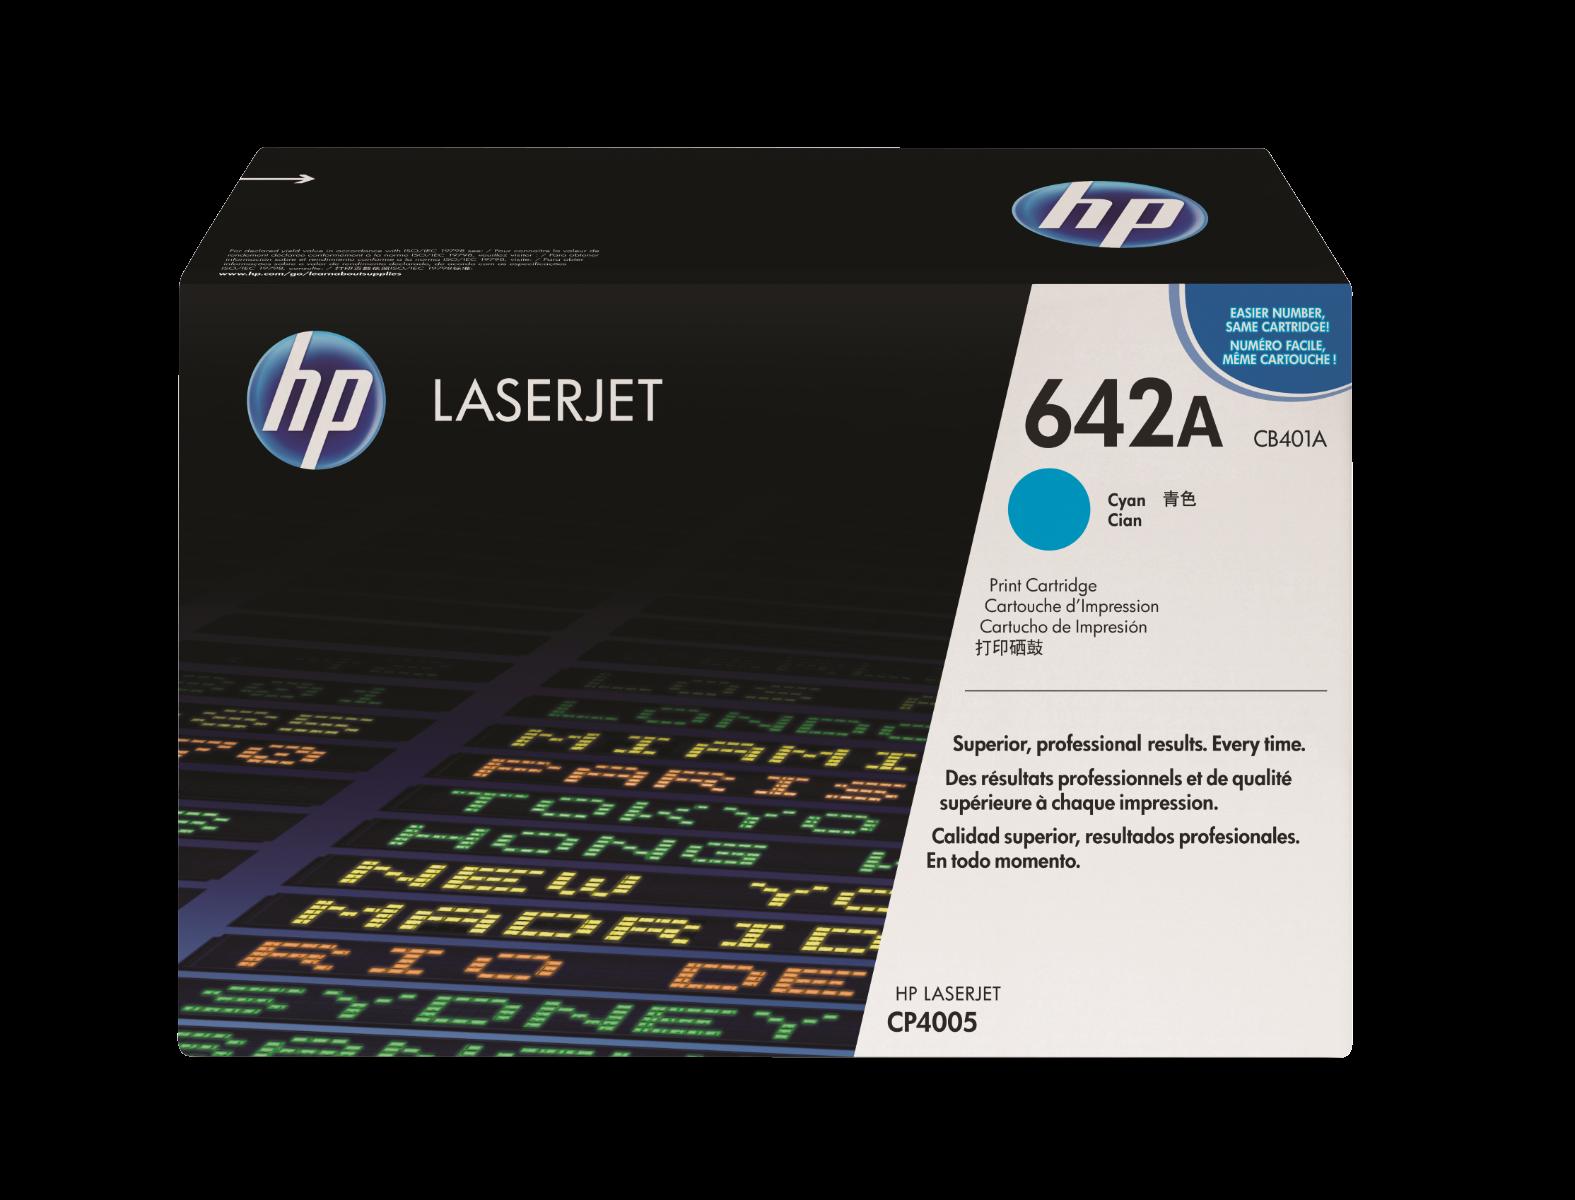 HP CB401A CYAN (LJ C4005) 642A_2